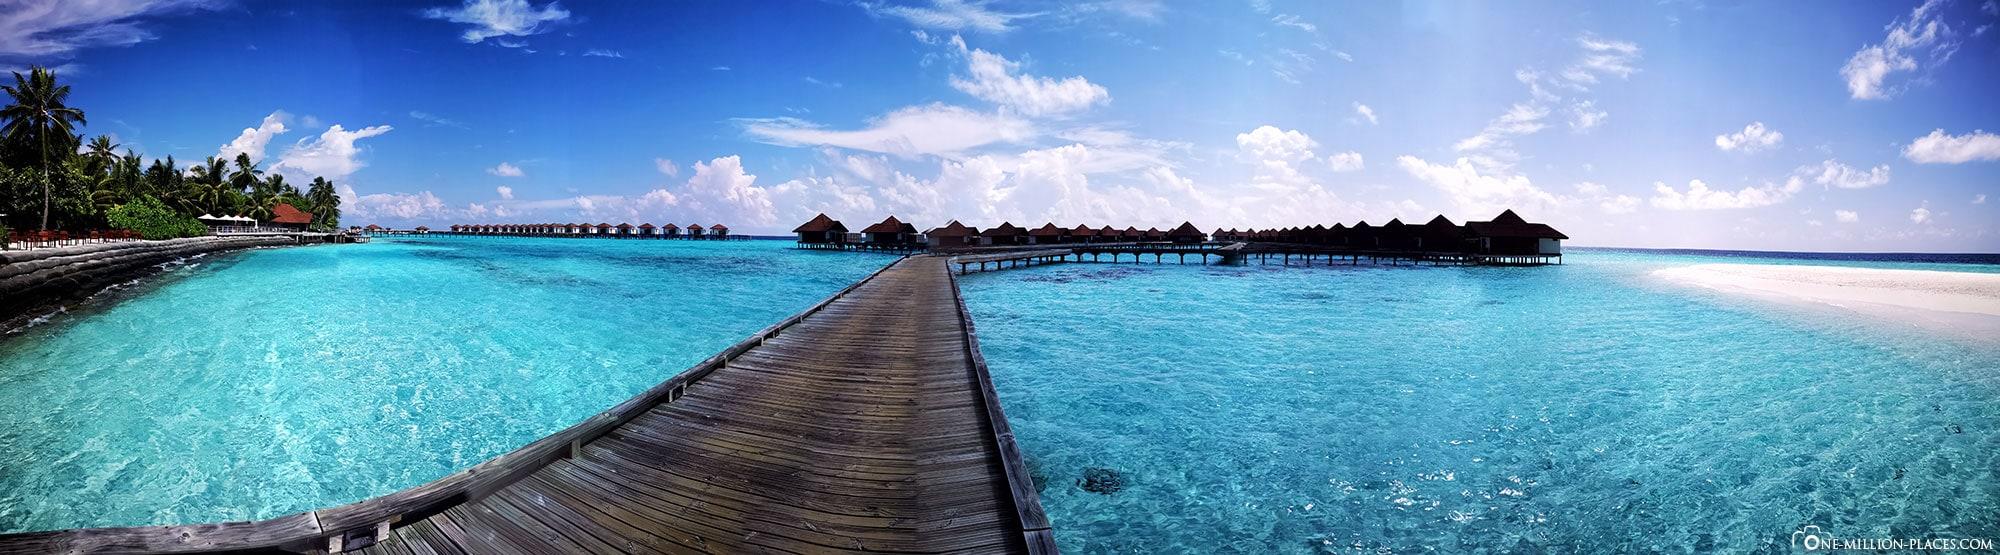 Panoramabild Steg, Wasserbungalow, Overwater Bungalow, BUM2, ROBINSON Club Maldives, Malediven, Gaaf-Alif-Atoll, Reisebericht